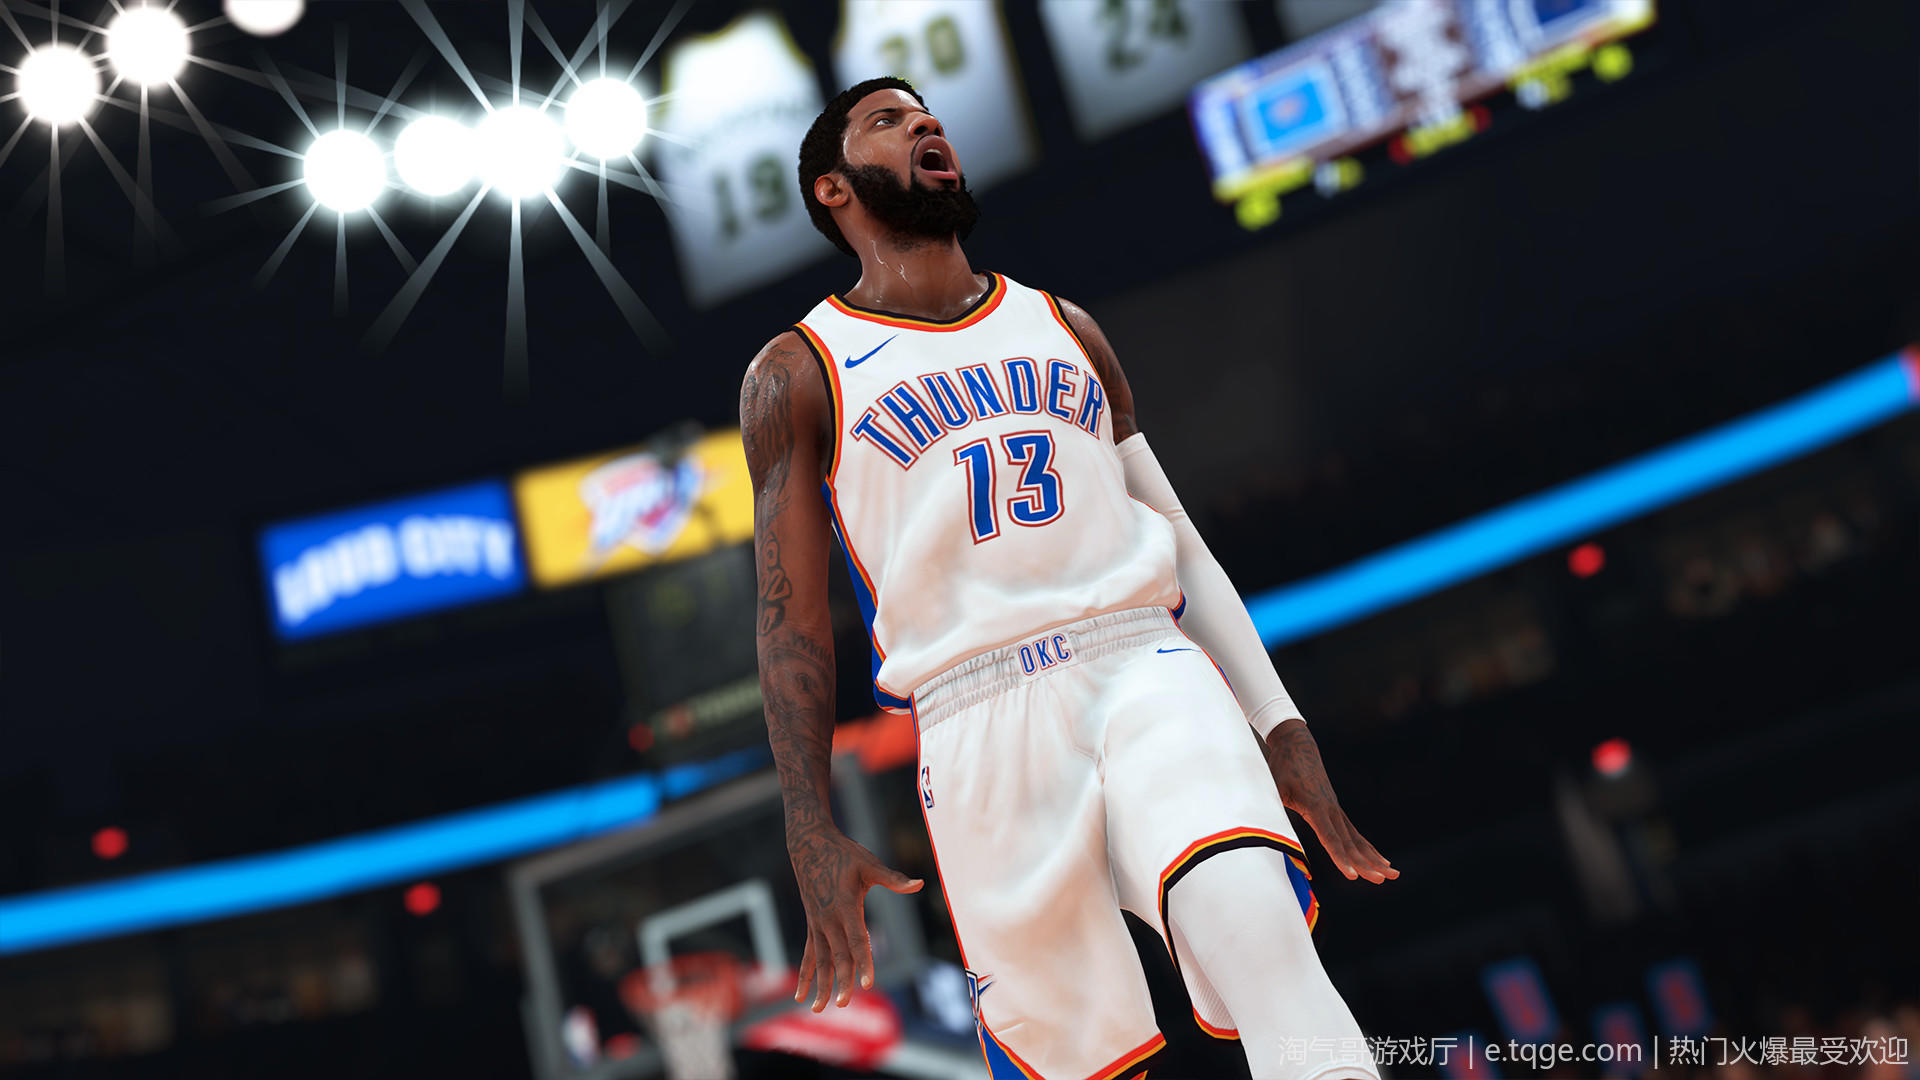 NBA 2K19【赠/18/17/16/15/14/13】 热门游戏 第1张